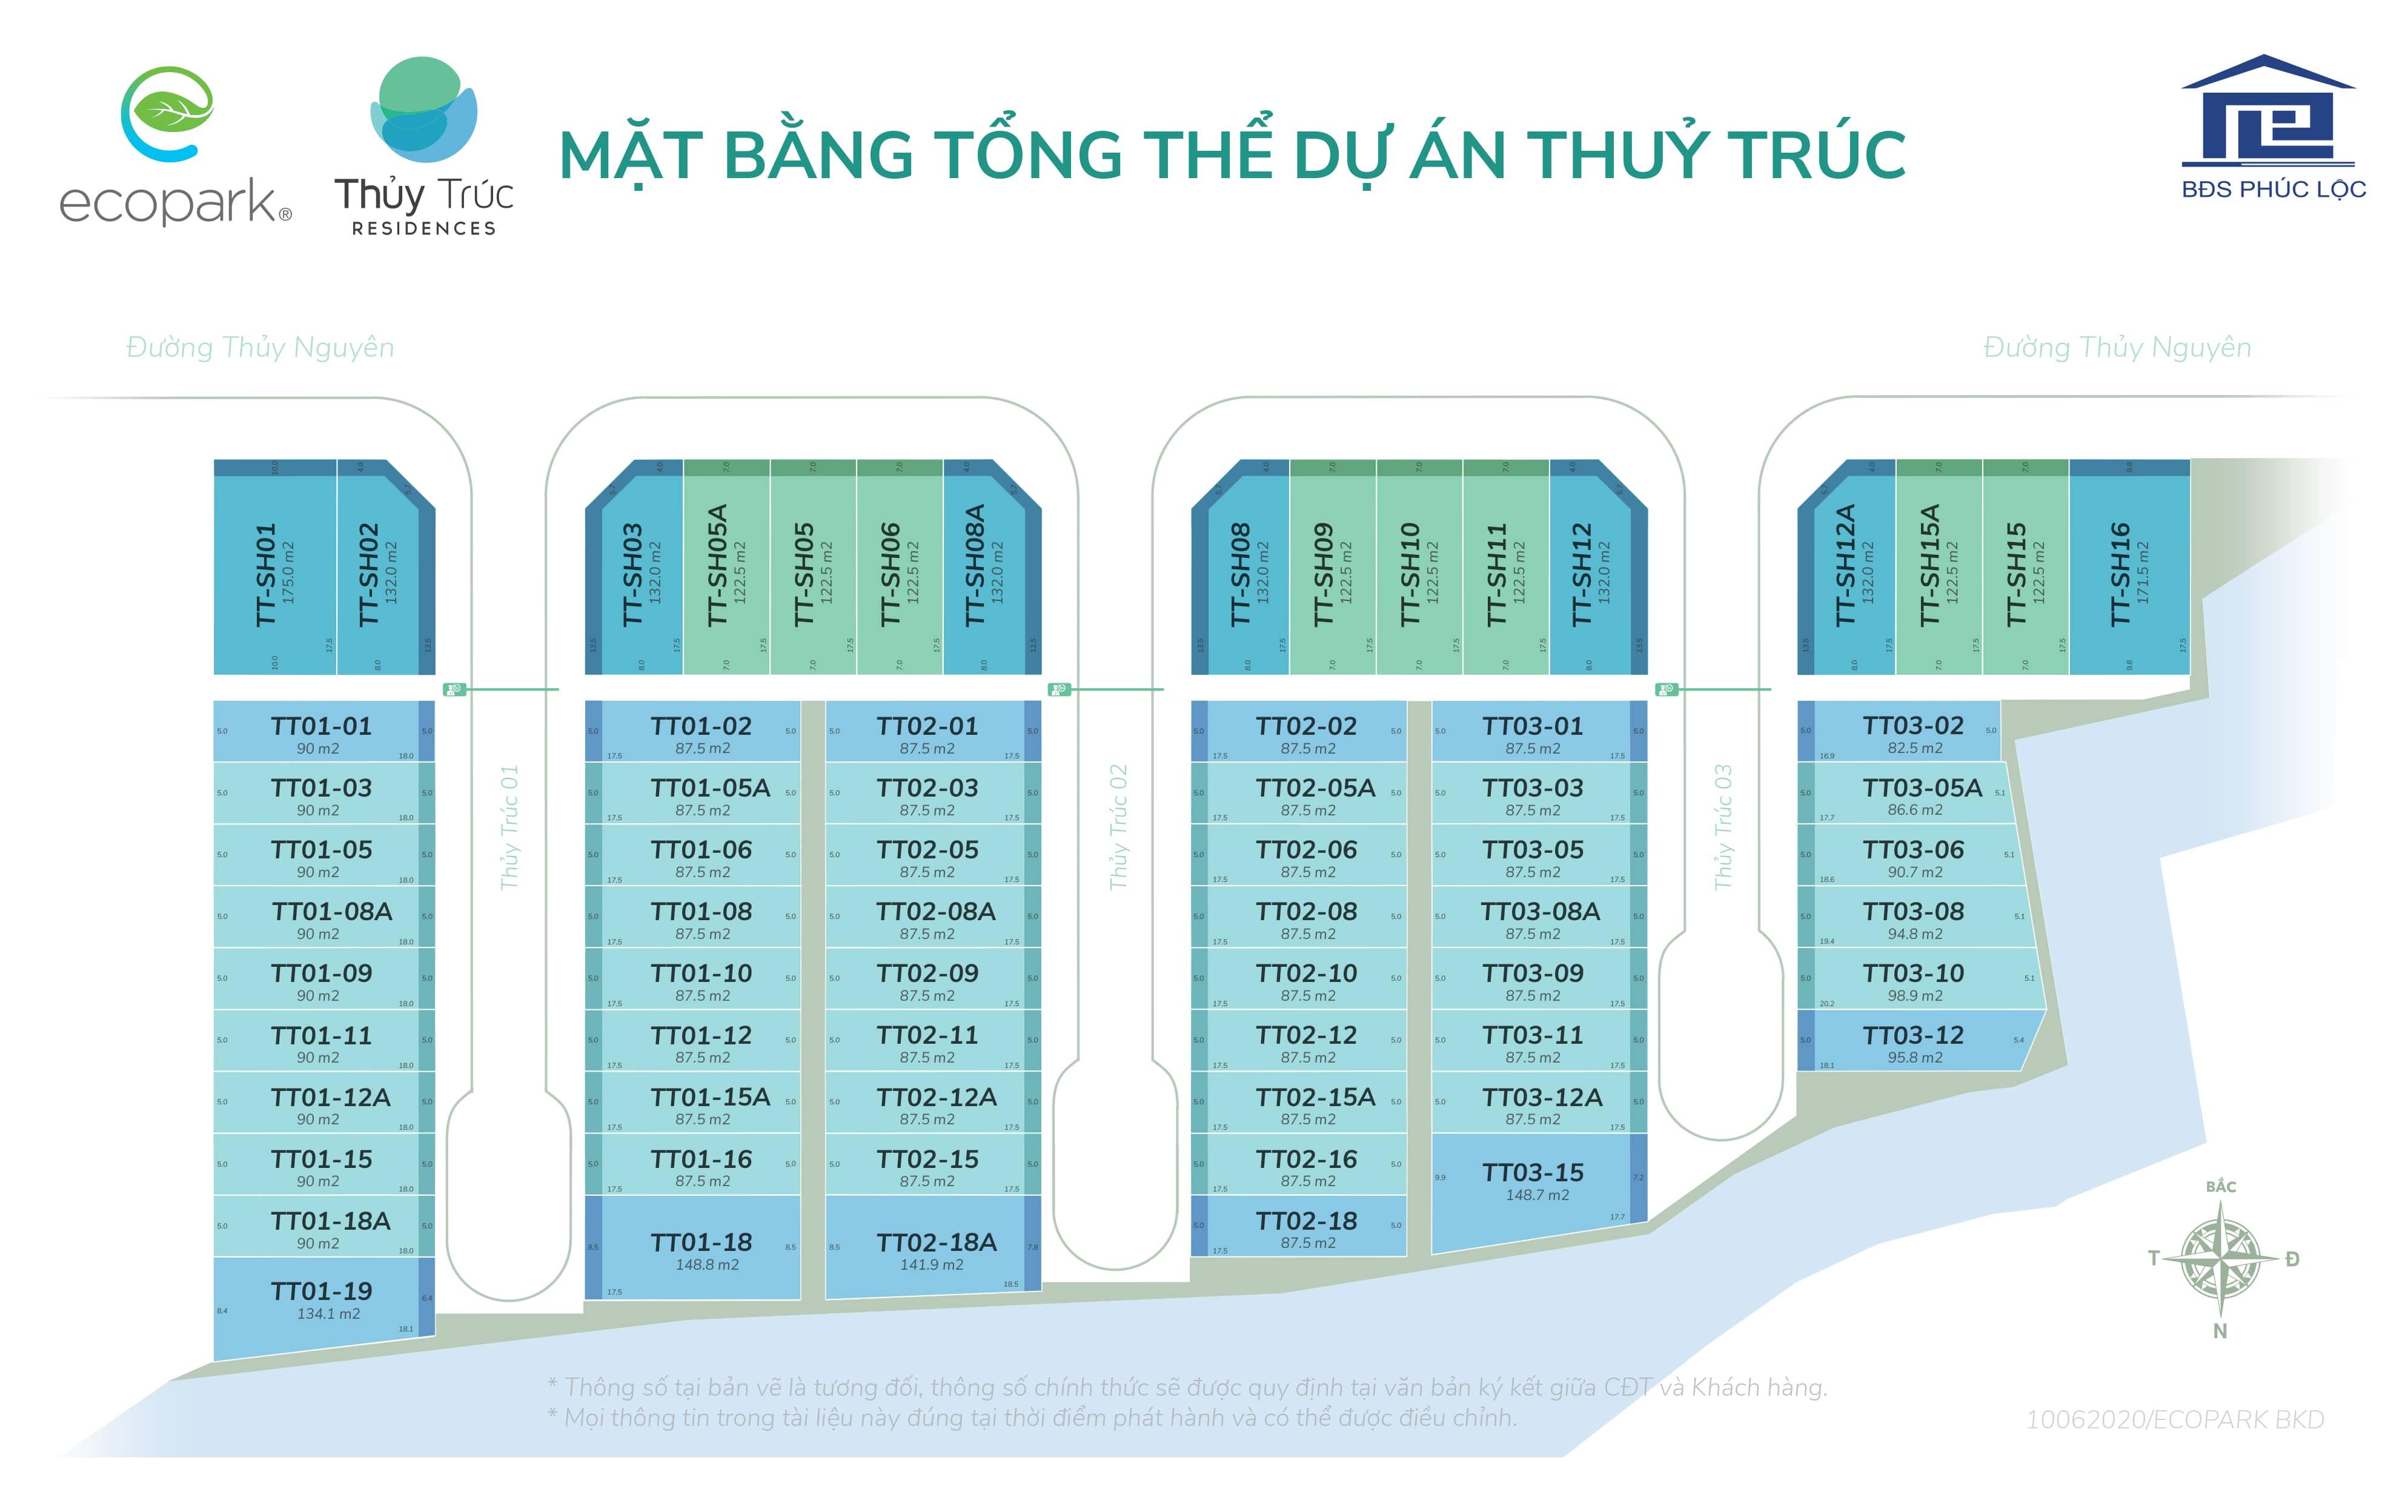 mat-bang-thuy-truc-1